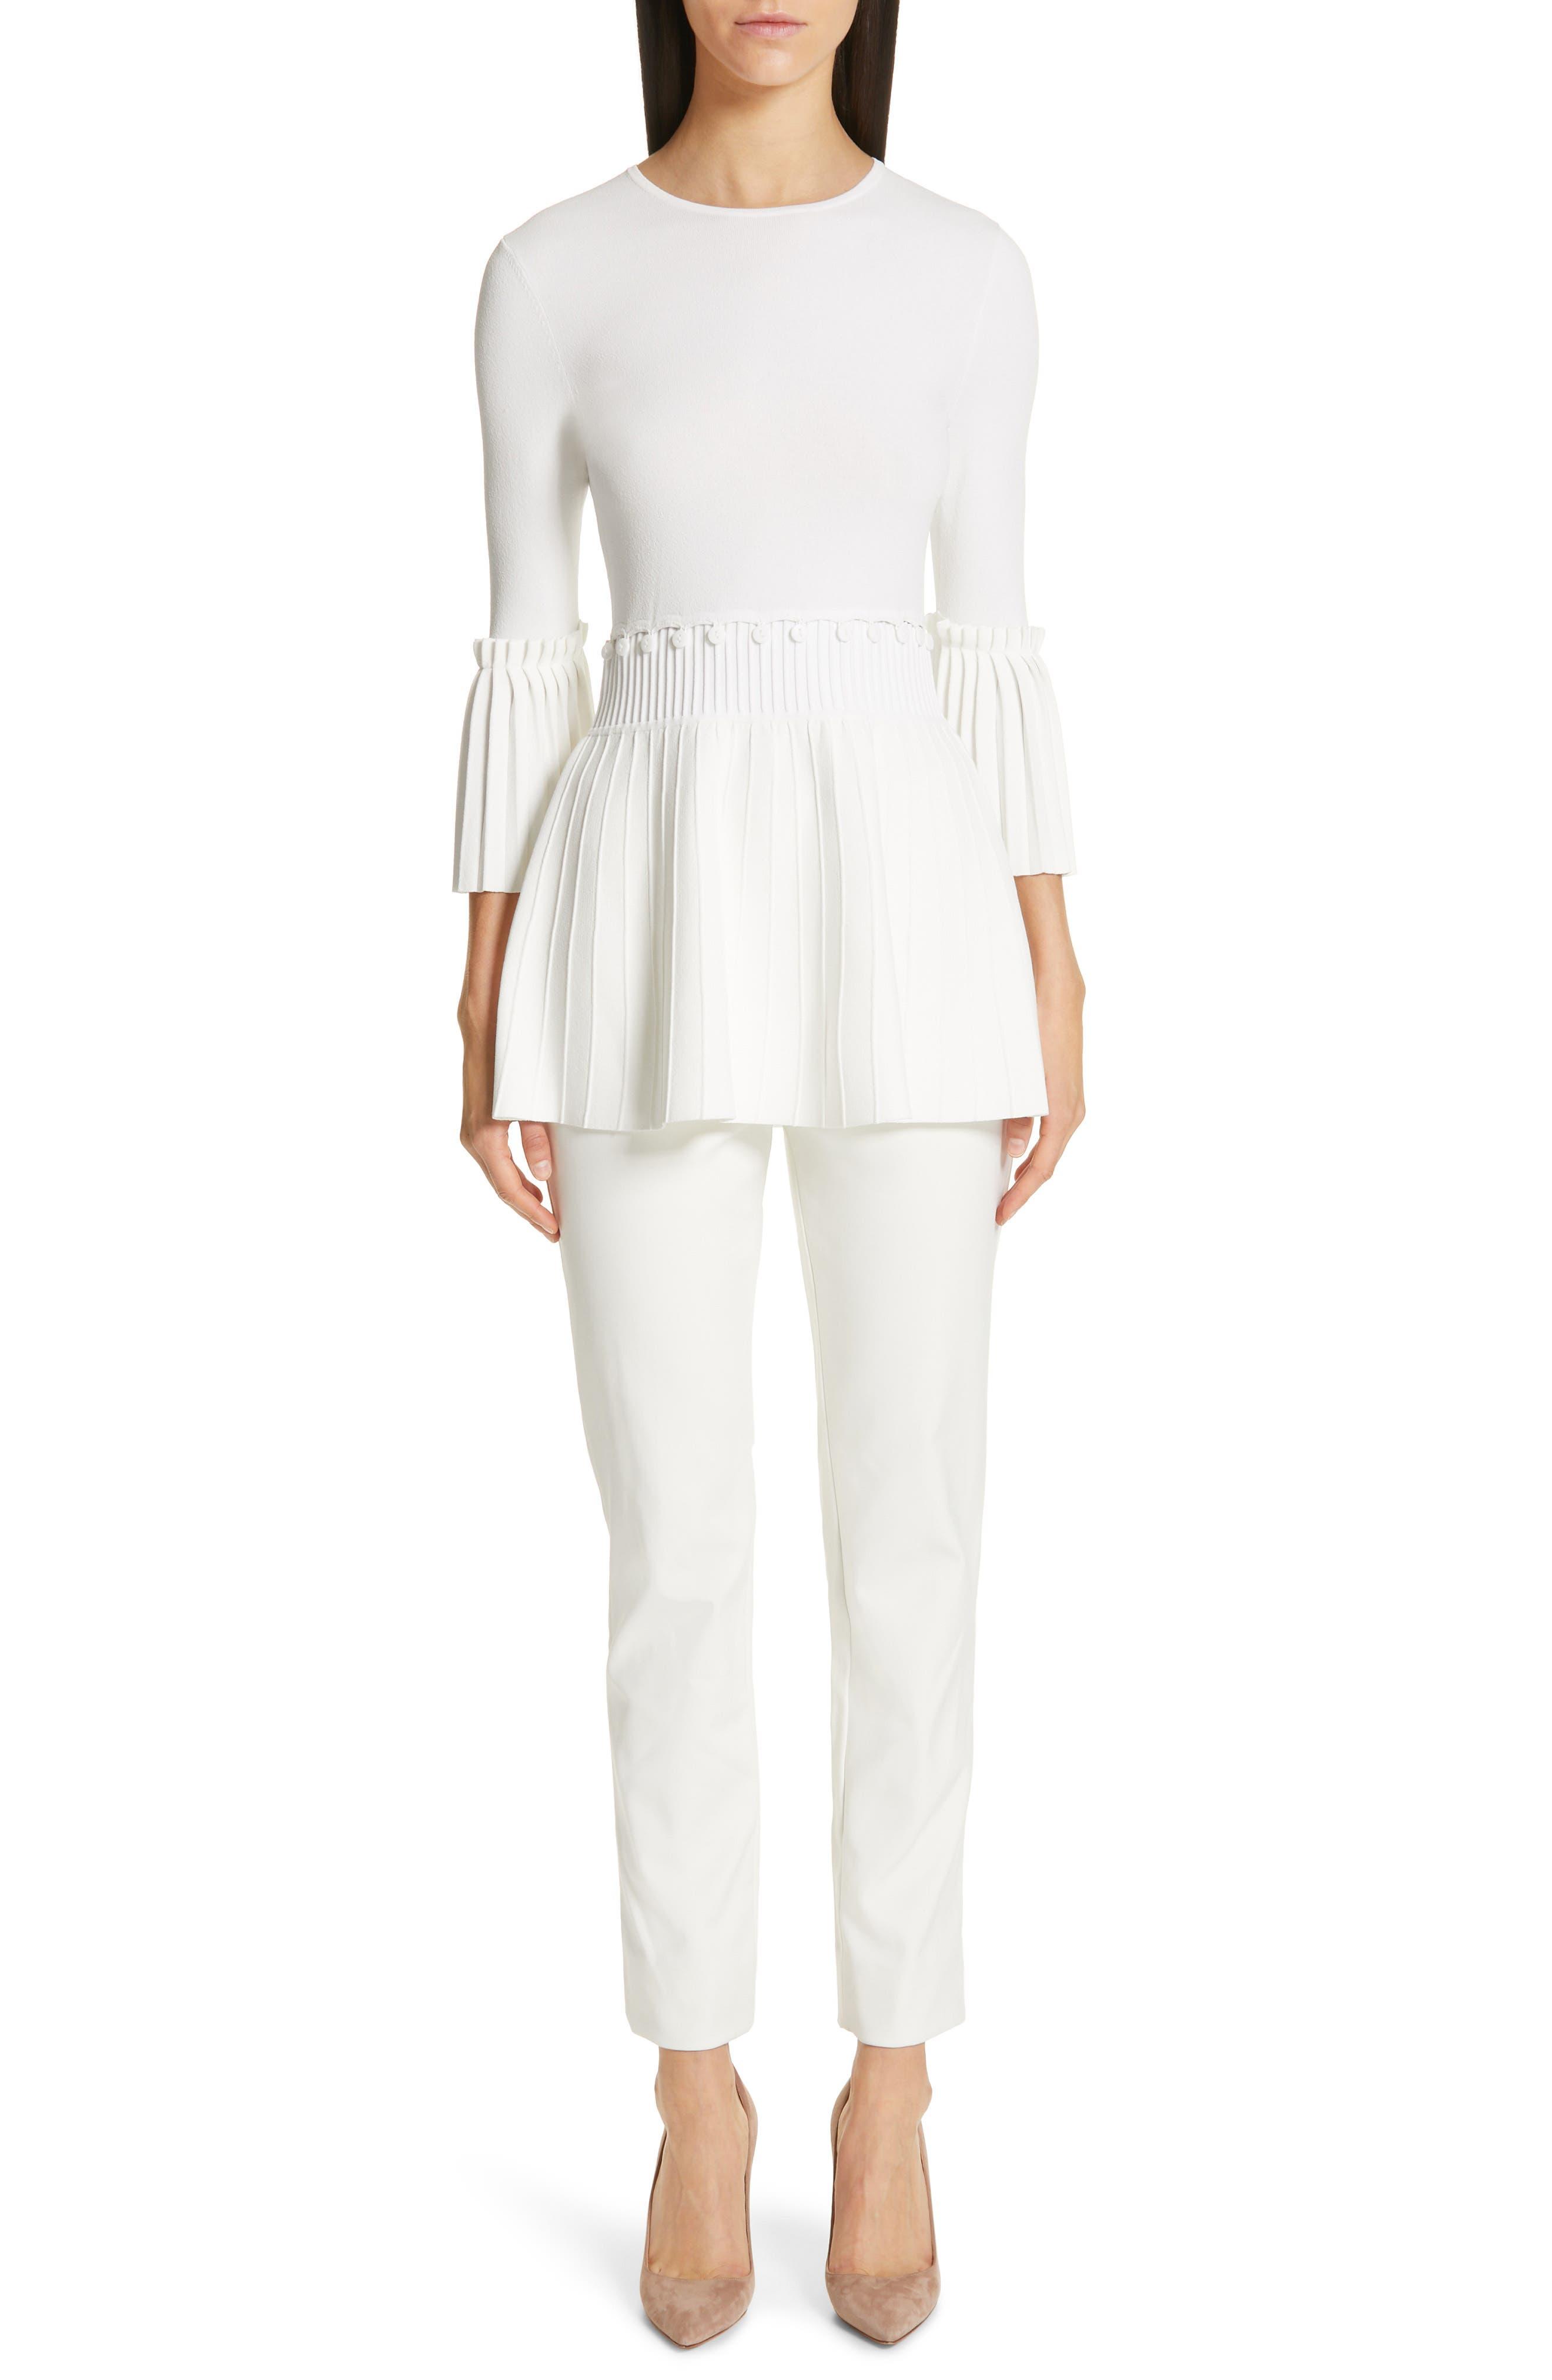 LELA ROSE,                             Pleated Knit Top,                             Alternate thumbnail 7, color,                             WHITE